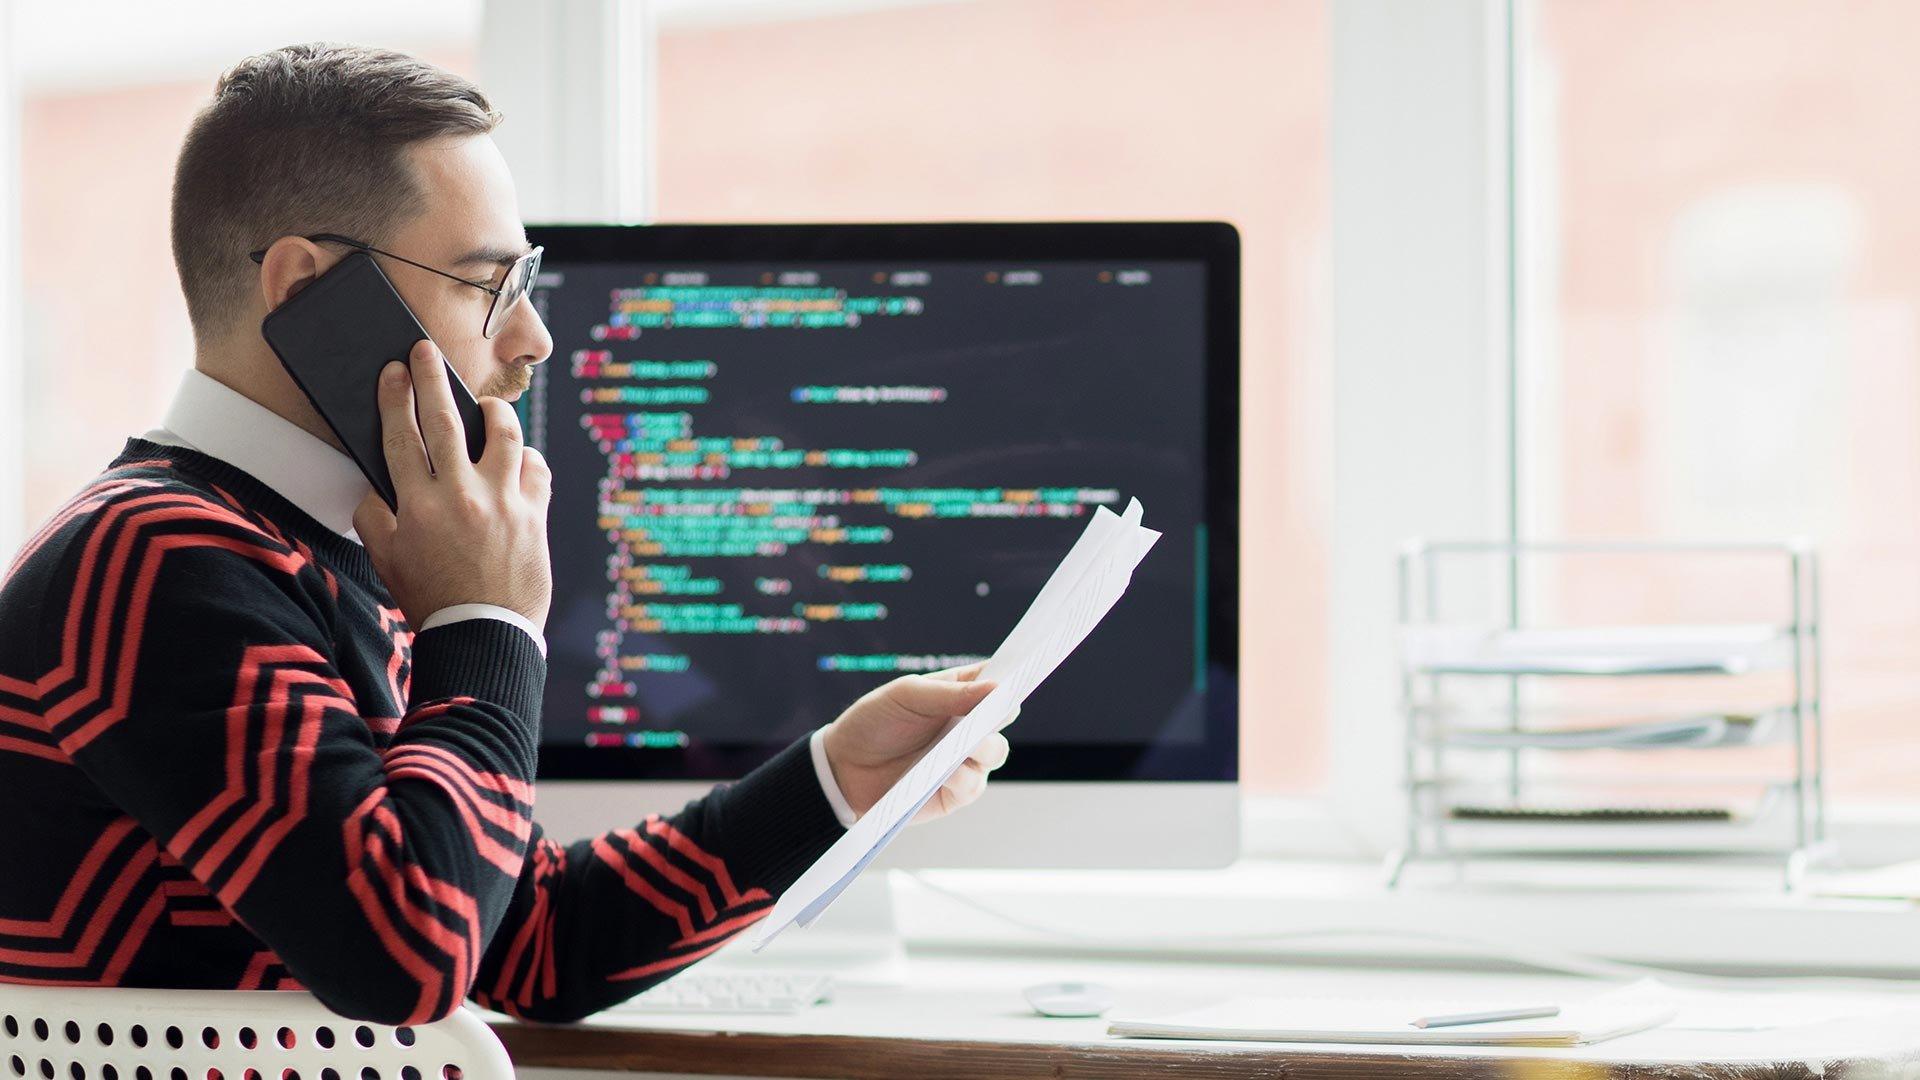 2020.04.09-Telna-Job-SoftwareDevManager